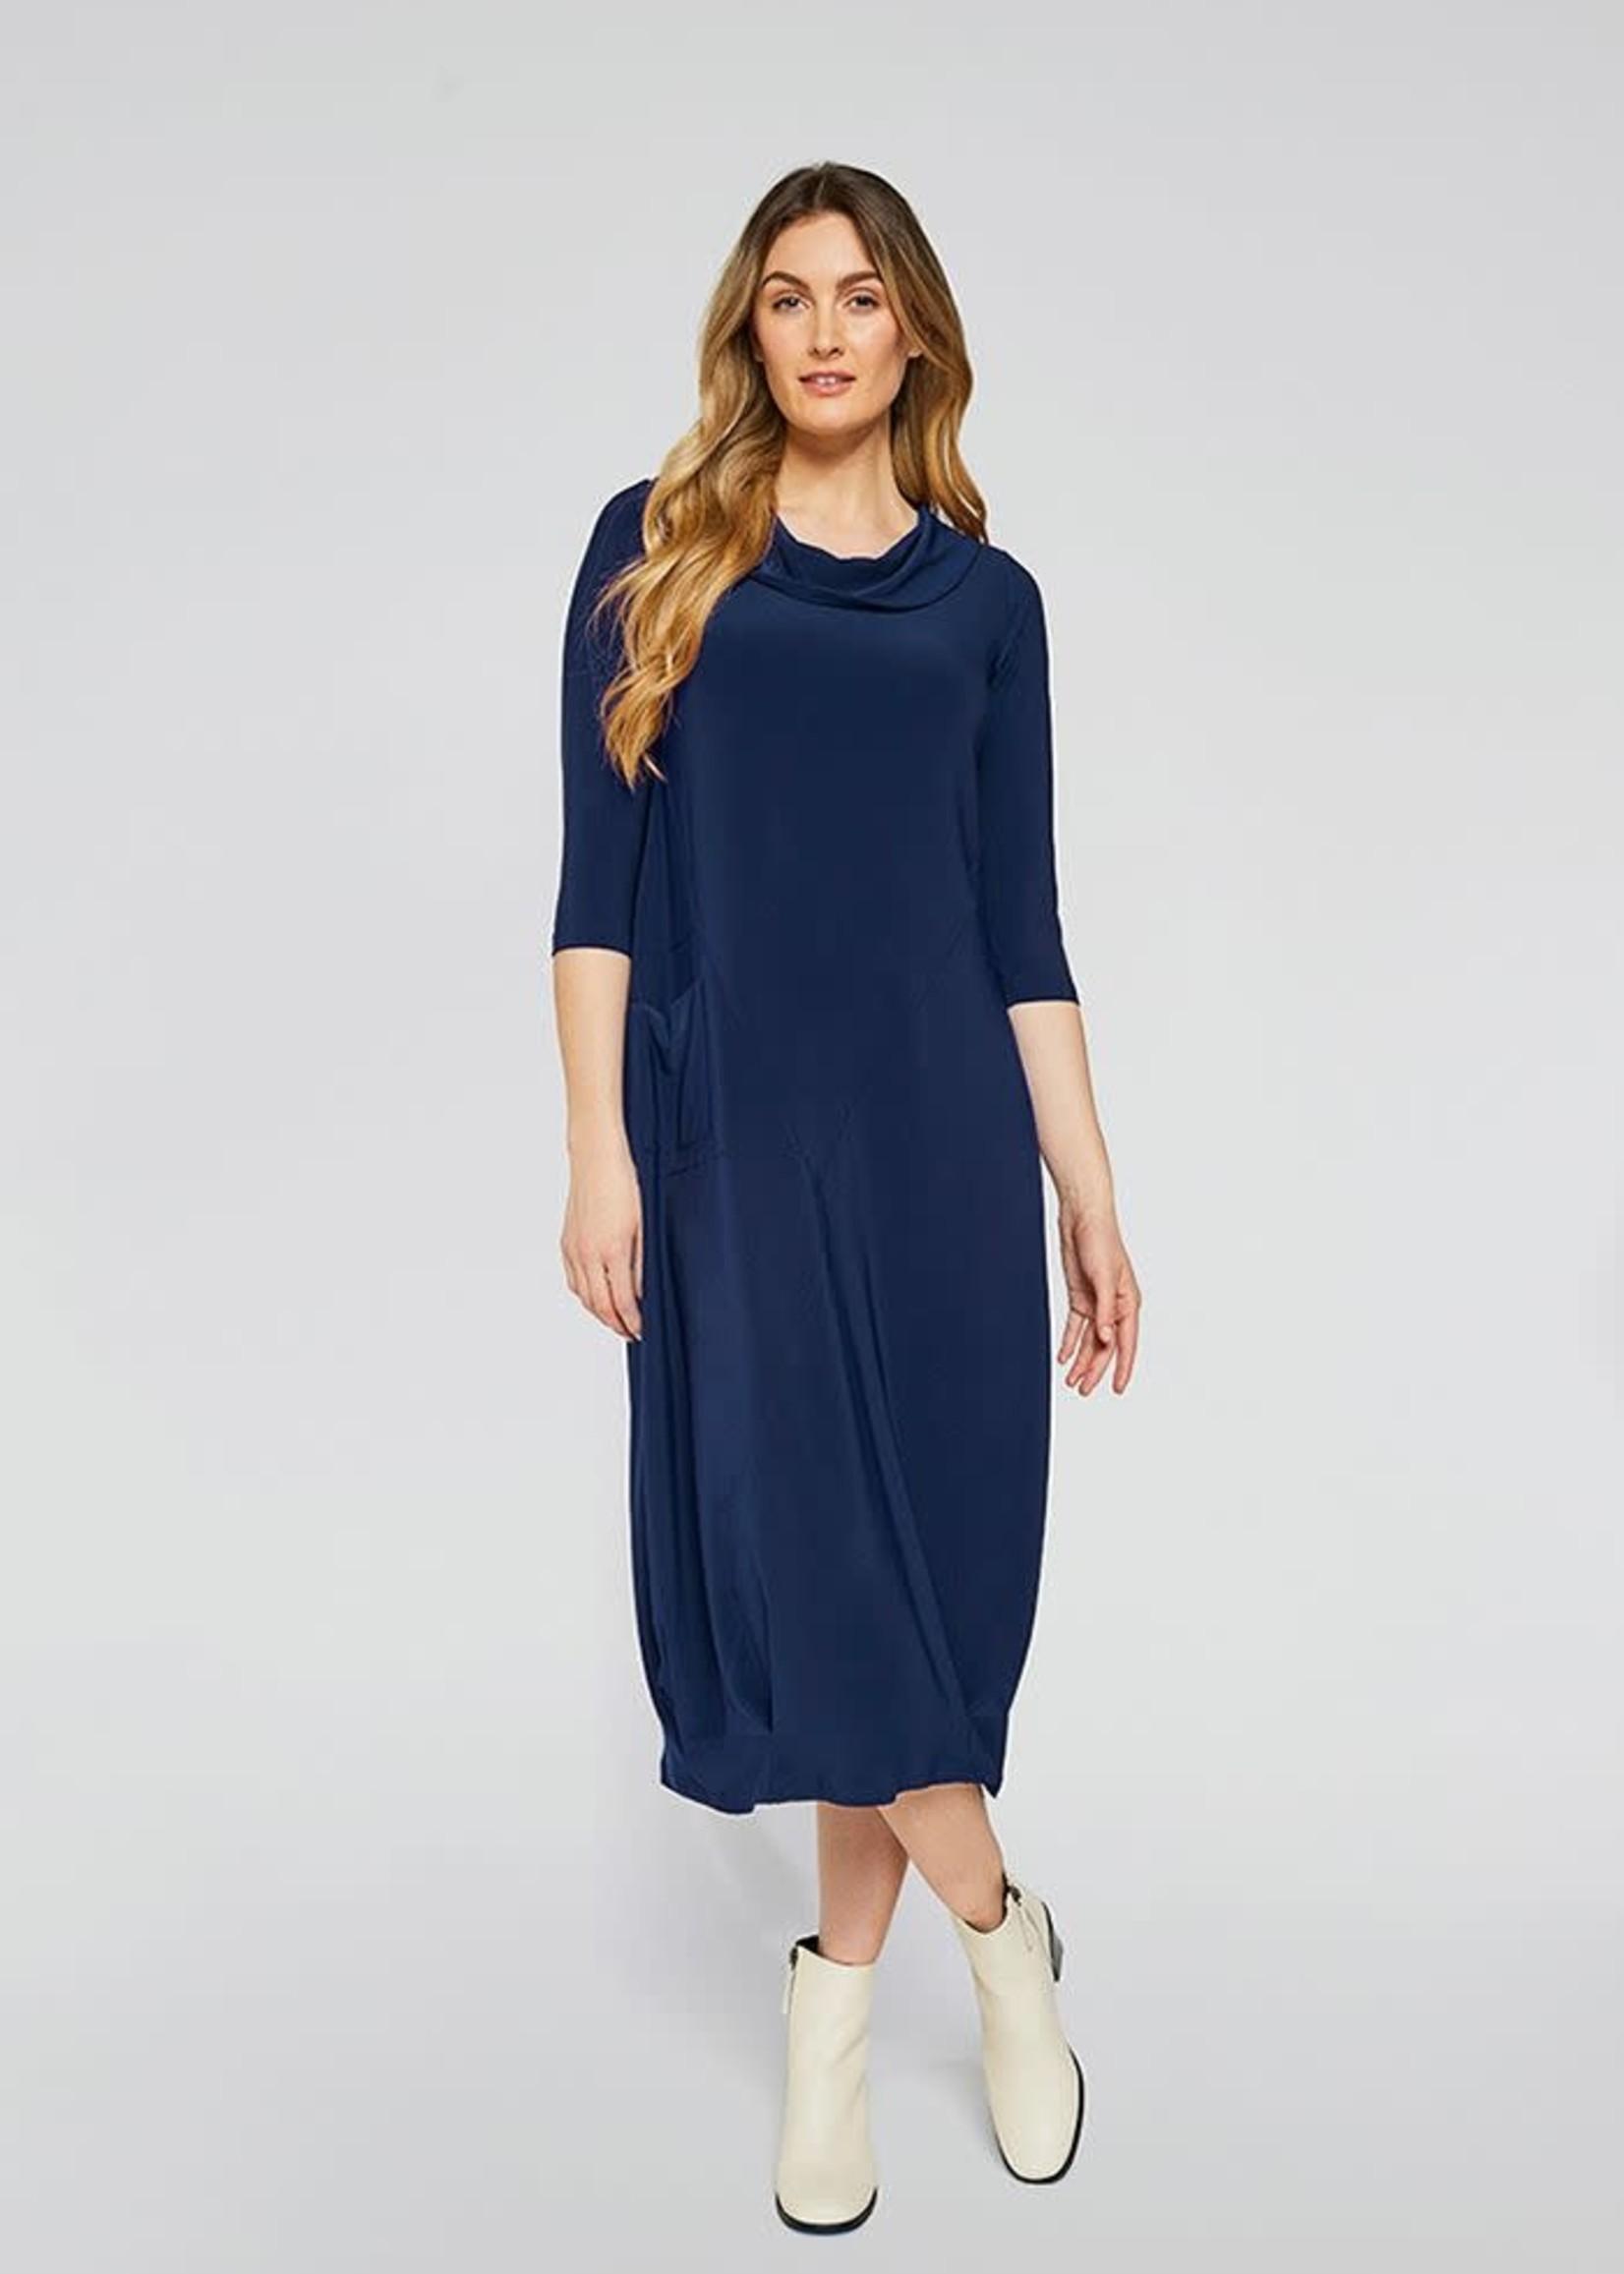 Sympli Sympli Angle Seam Pleat Hem Dress